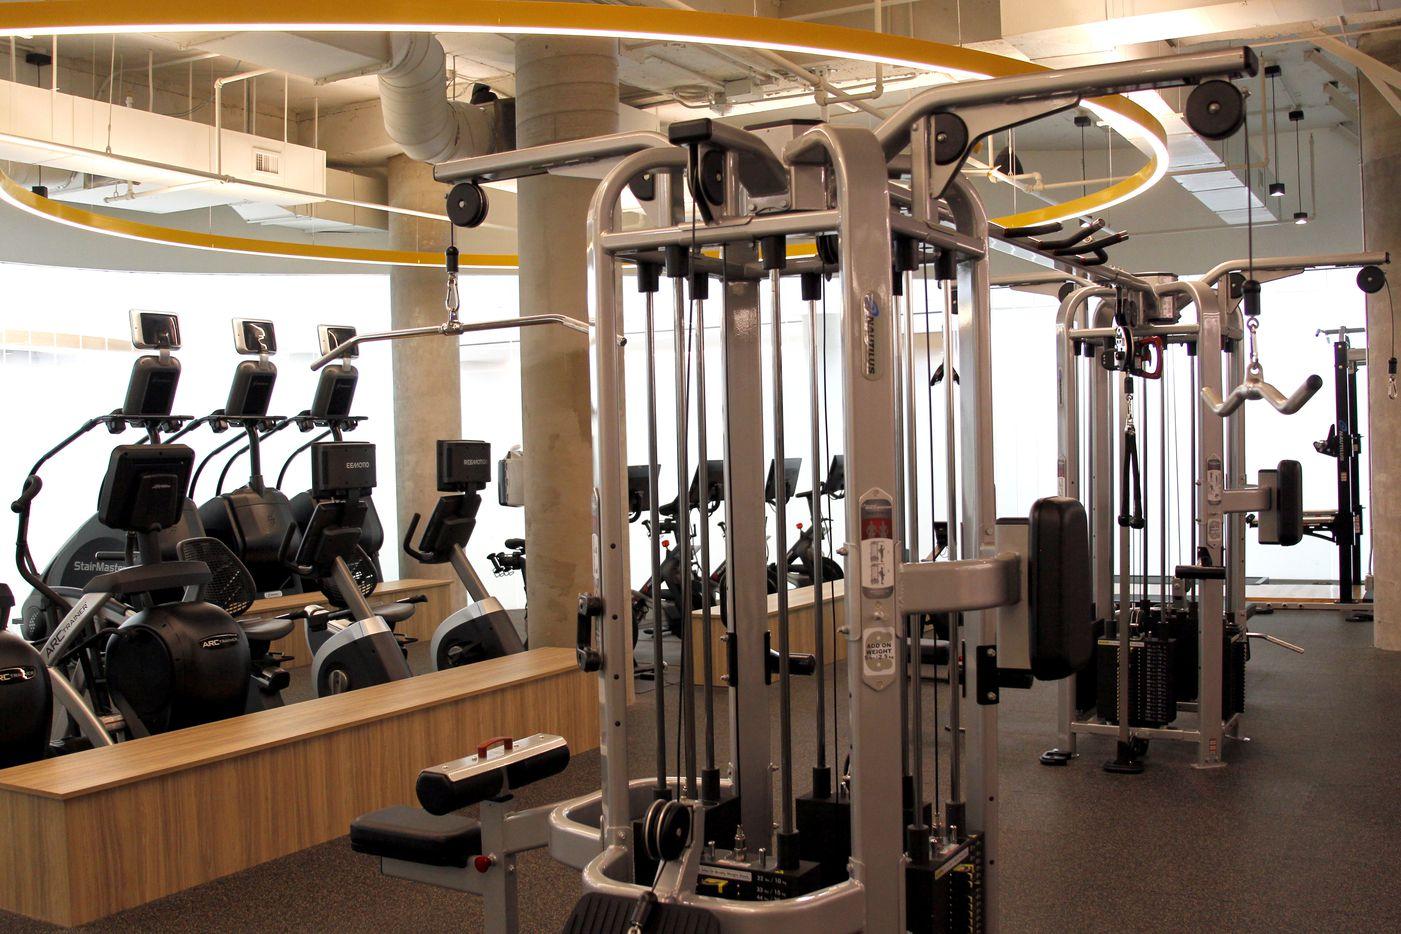 The new fitness center in the Lincoln Centre complex.